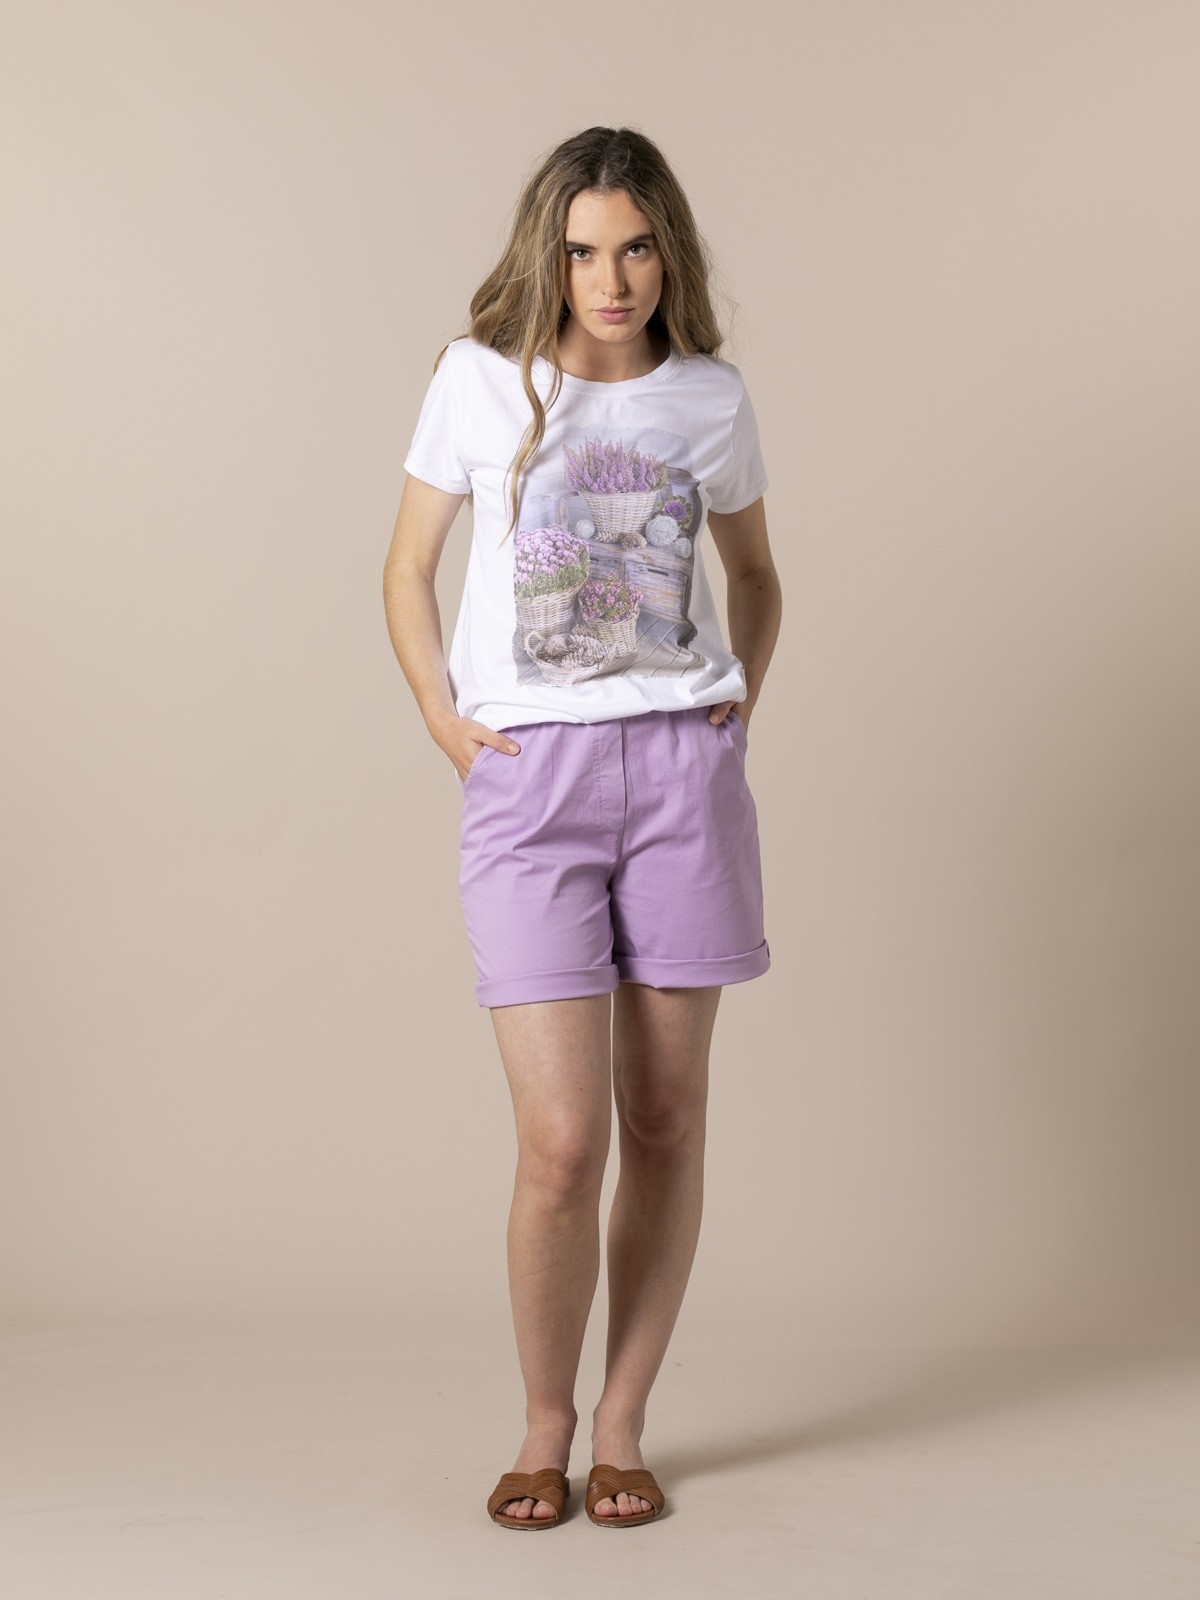 Camiseta mujer estampado floral Beige